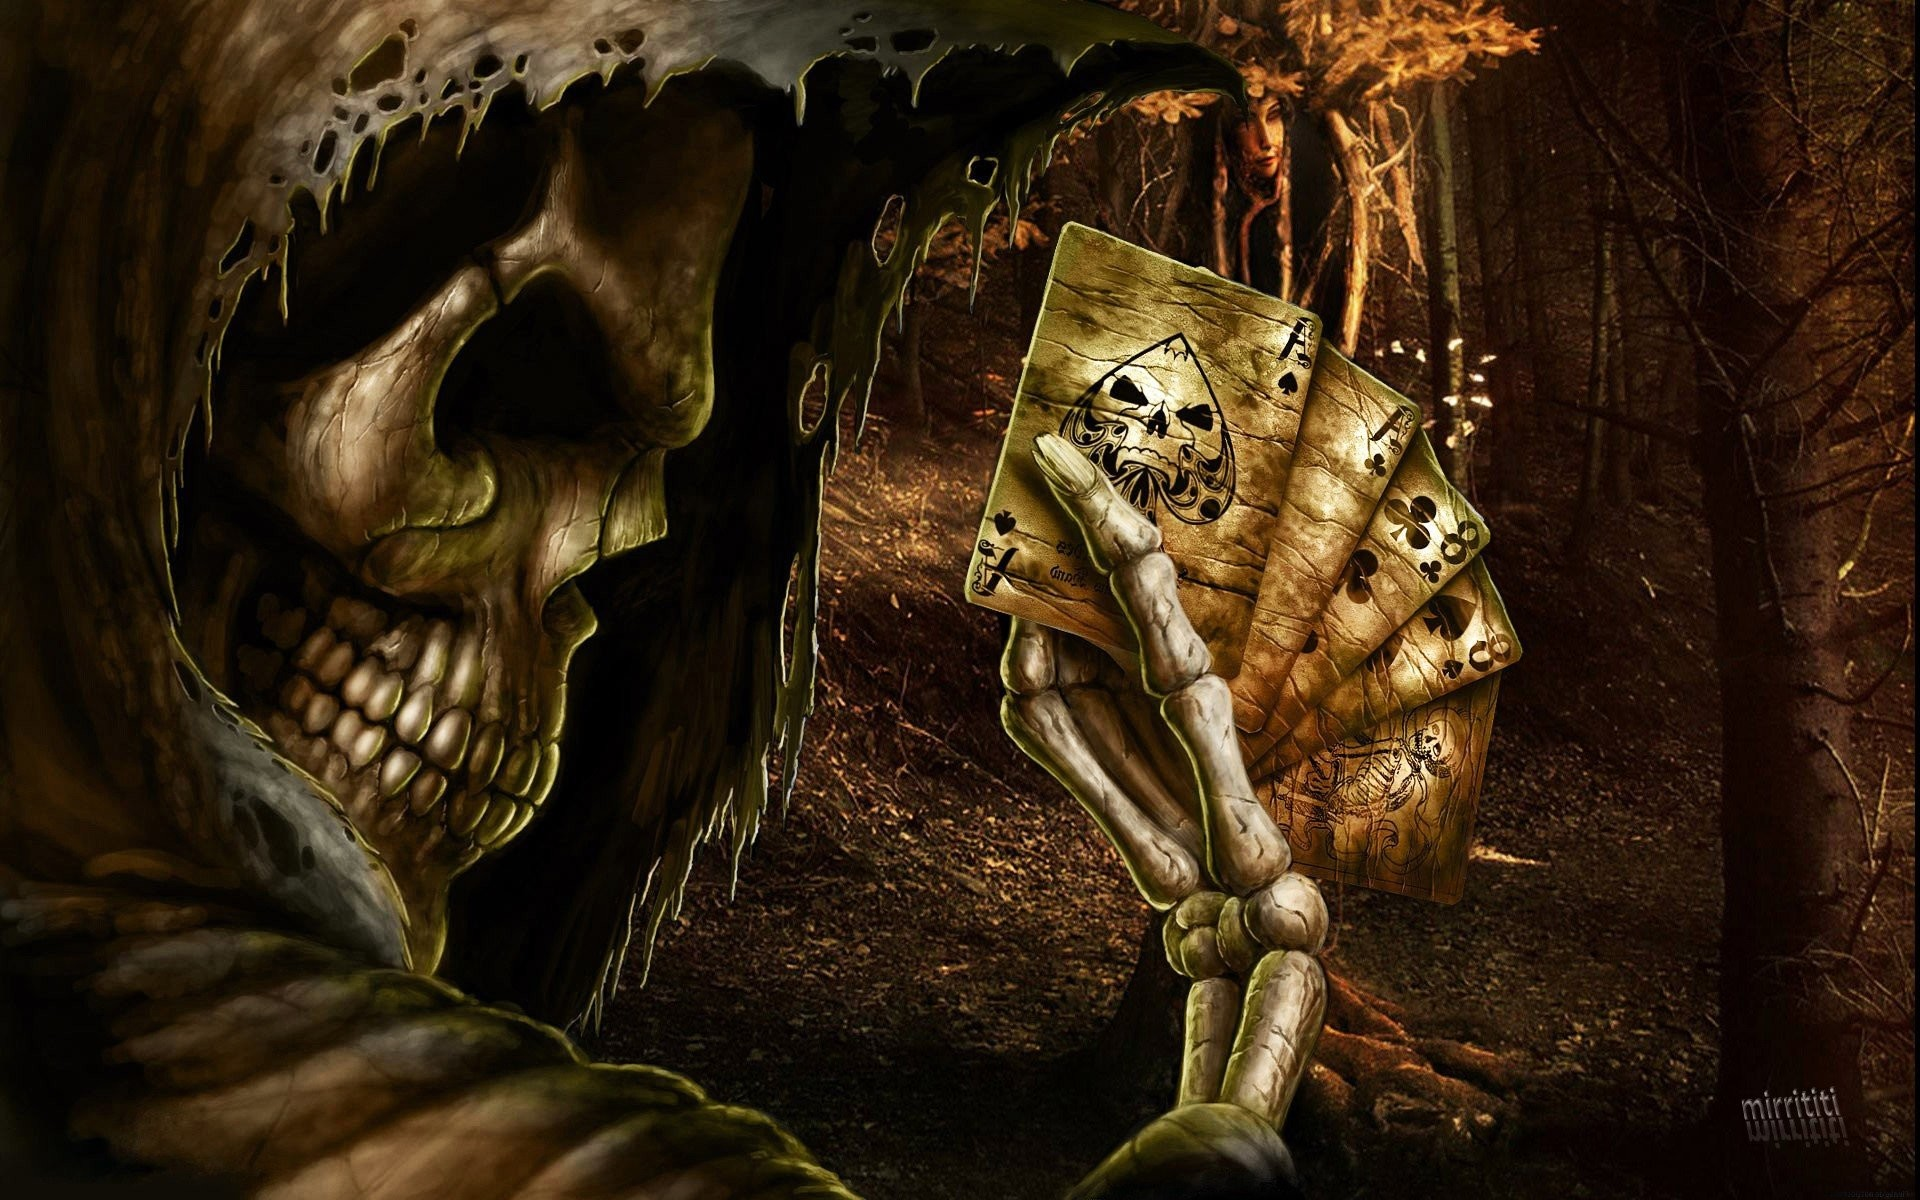 Dark Grim Reaper horror skeletons skull creepy cards games poker ace spades  f wallpaper | | 55426 | WallpaperUP